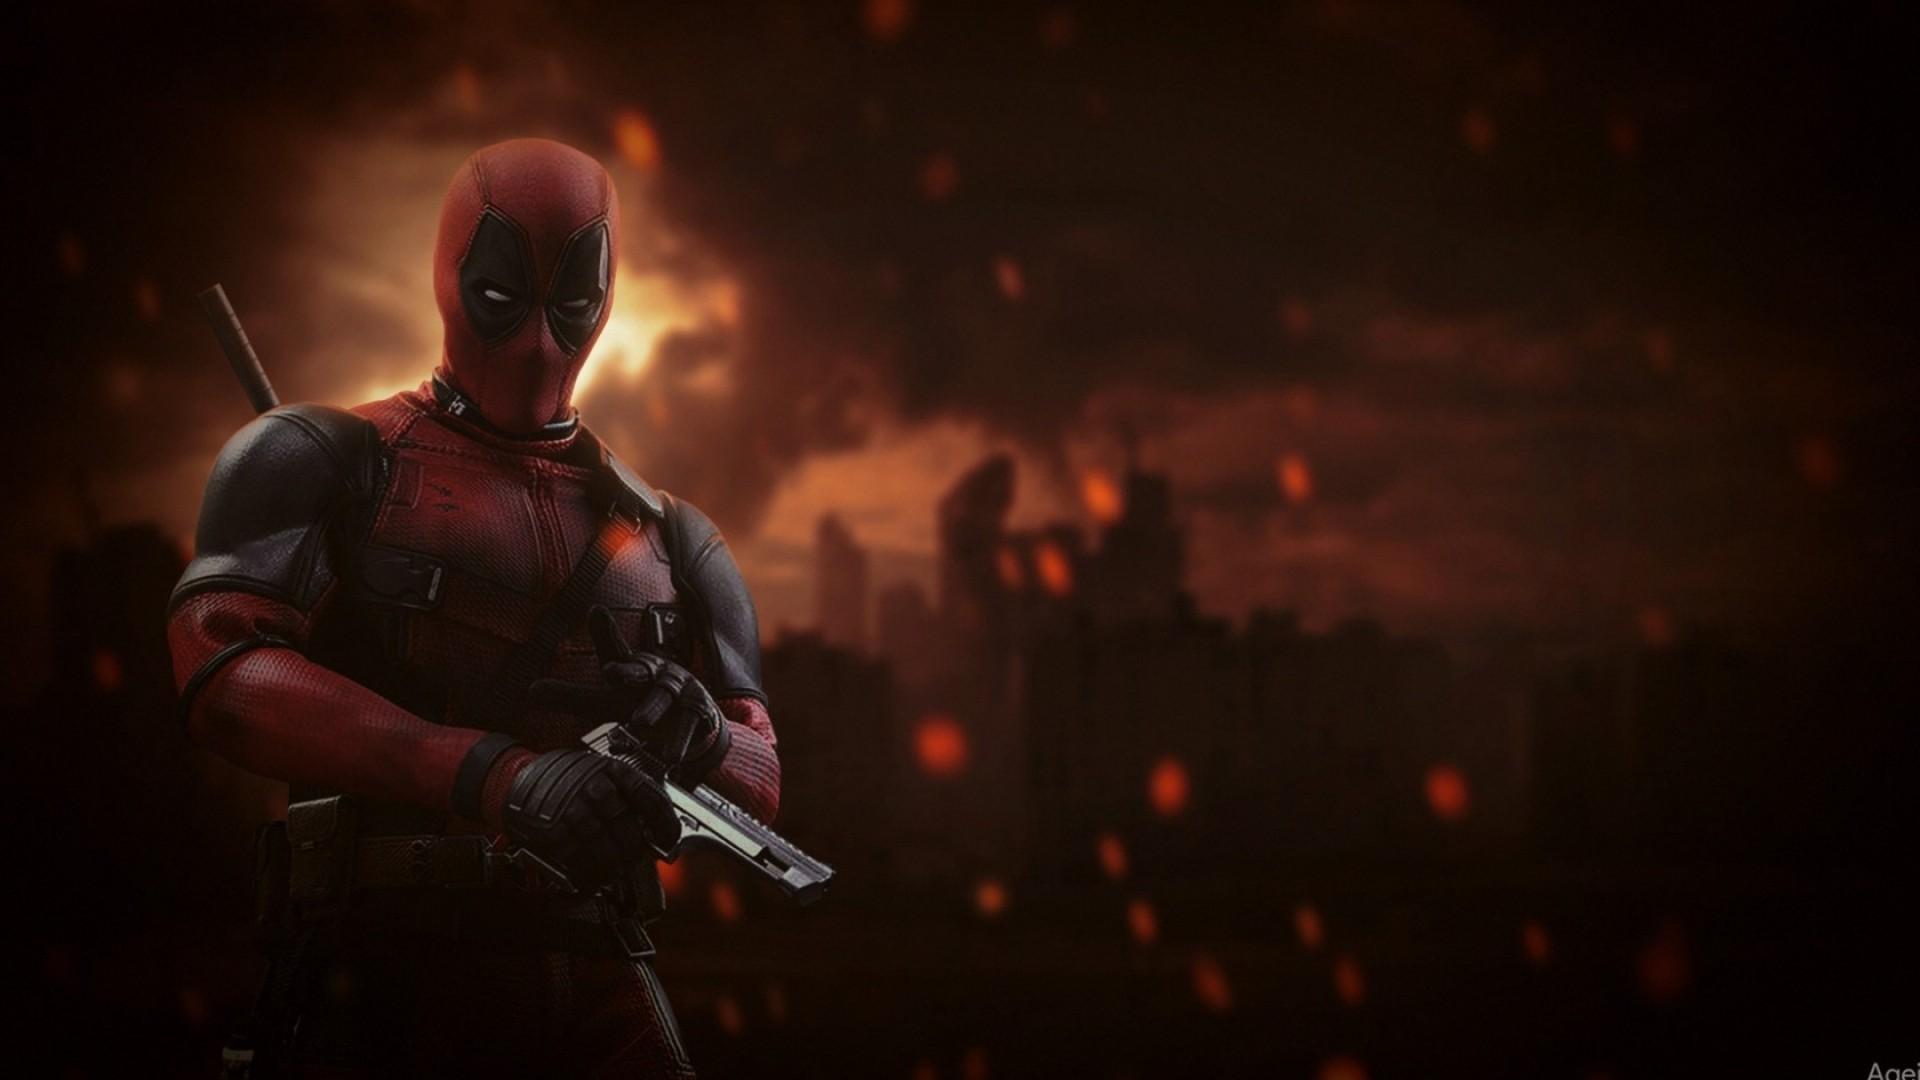 Deadpool wallpaper HD 1080p ·â' Download free stunning HD